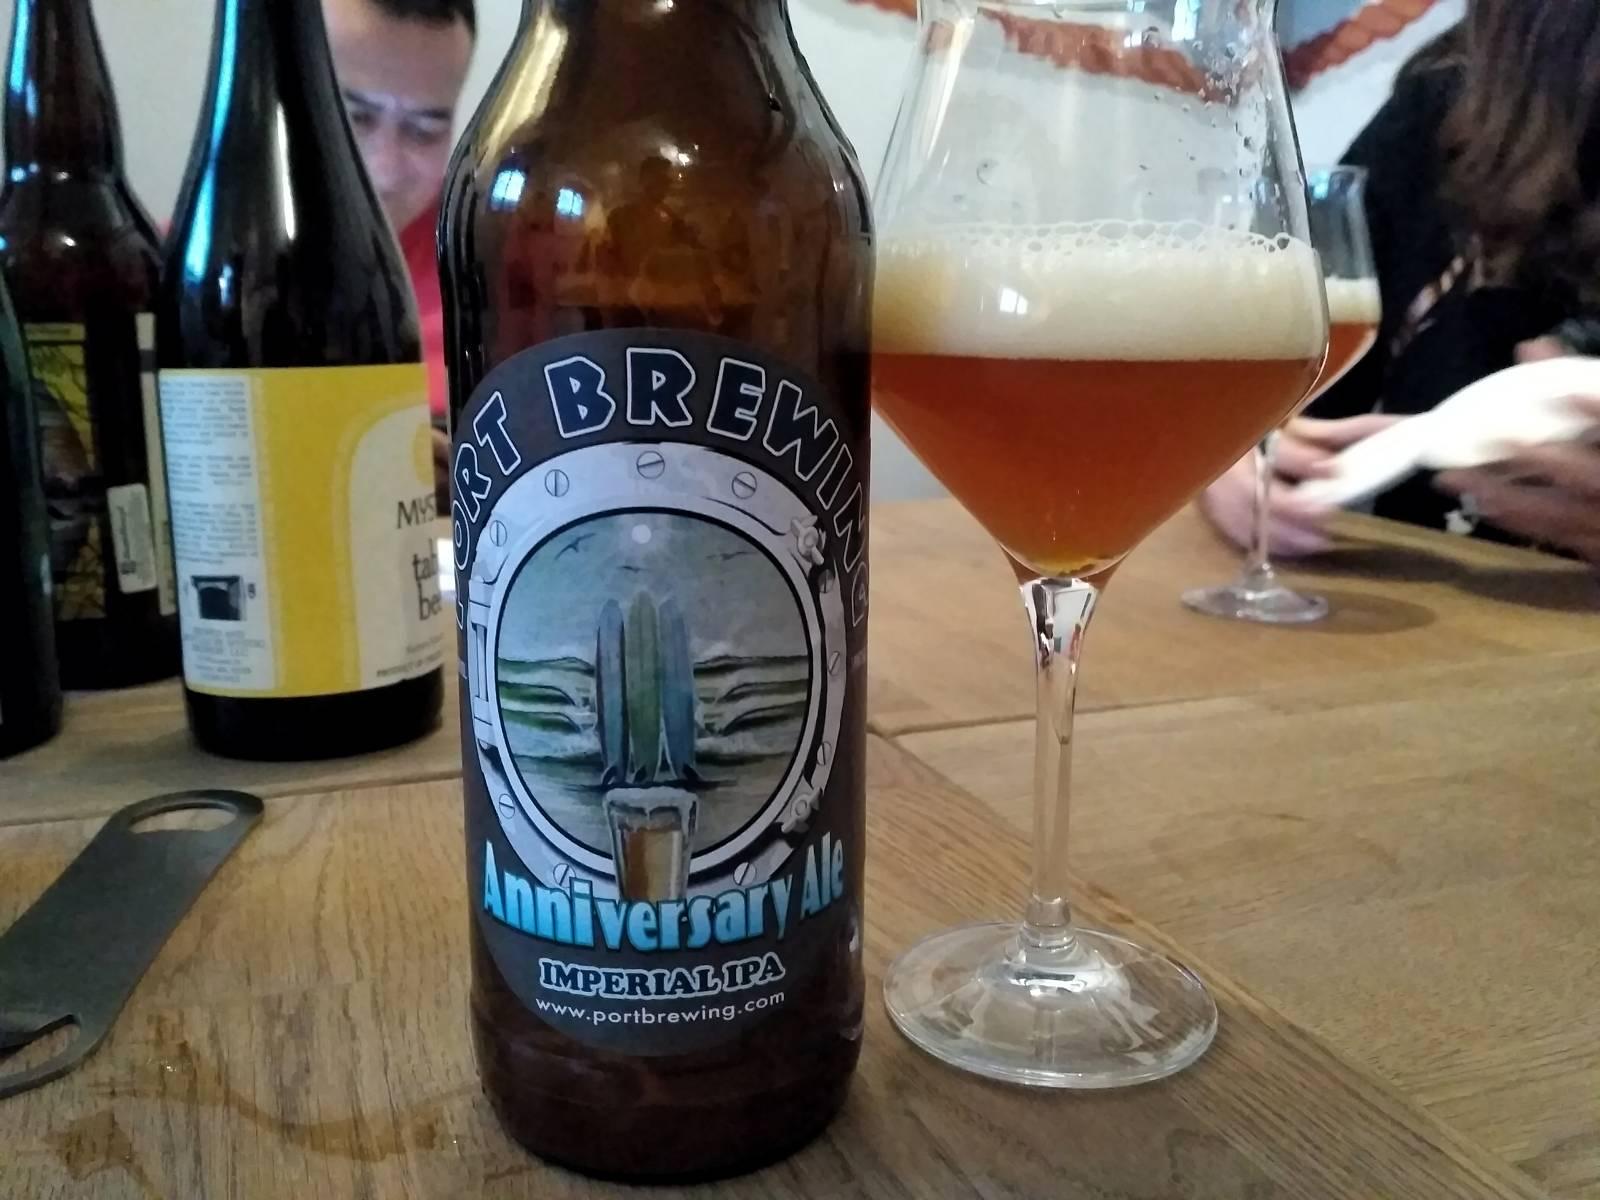 port-brewing-anniversary-ale-iipa-recenzja